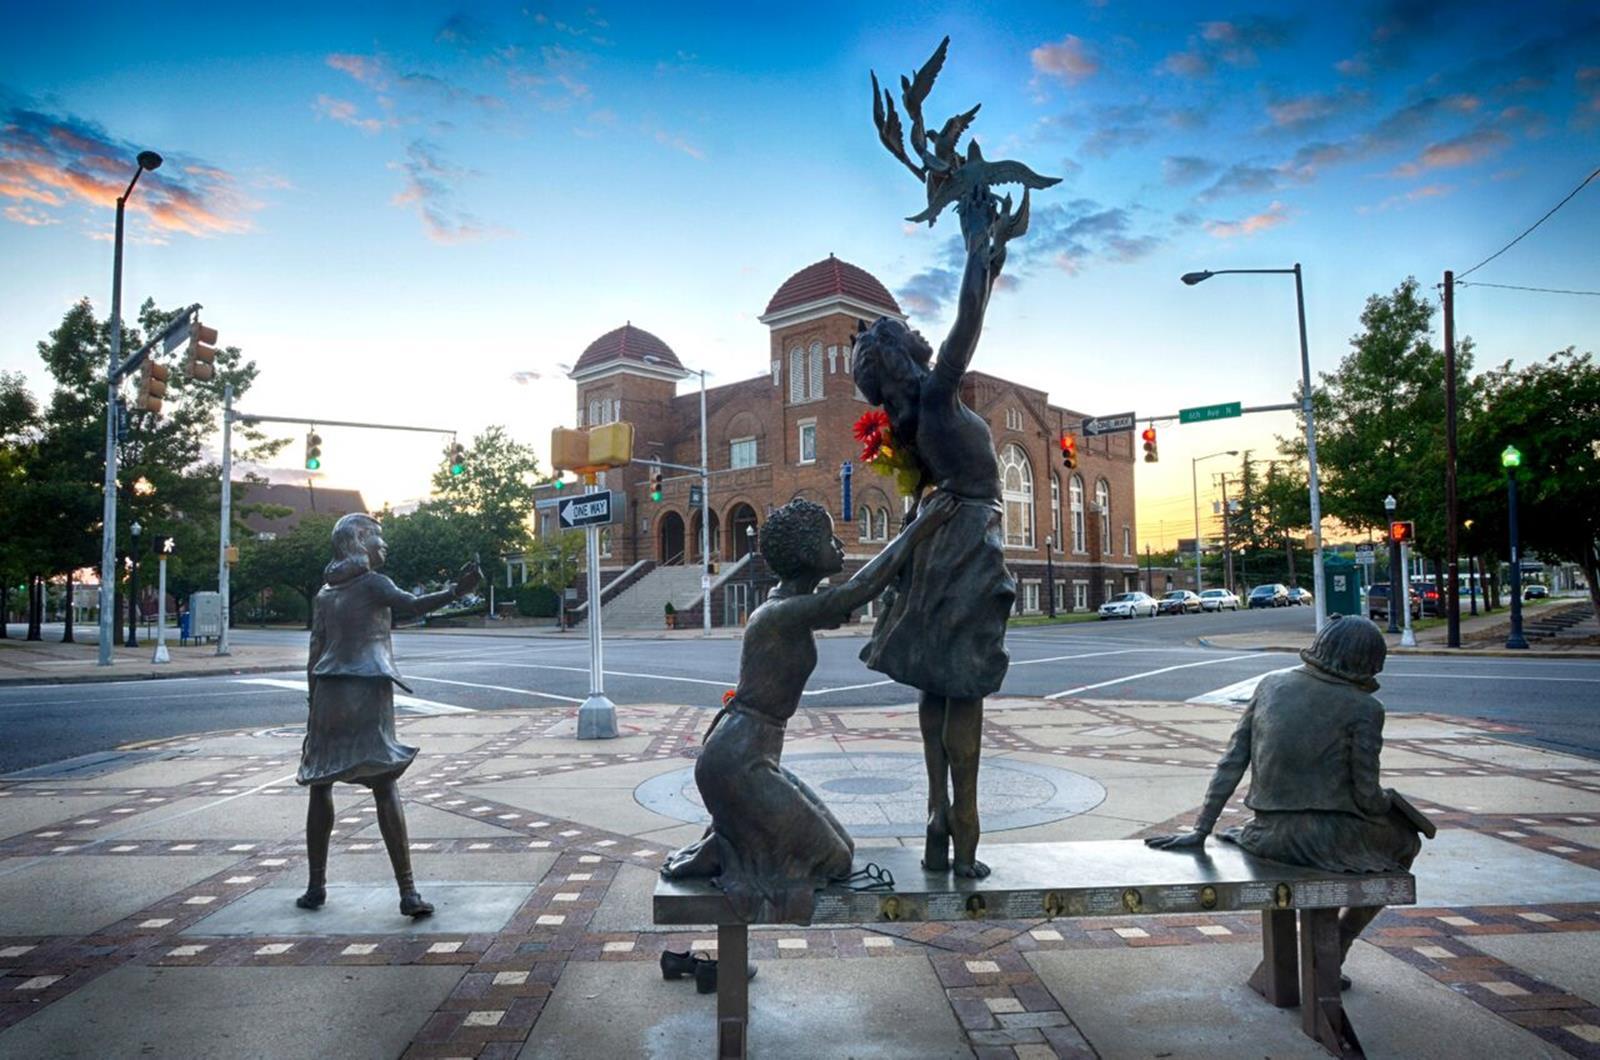 16th Street Baptist Church Memorial Fountain. Credit: Birmingham CVB